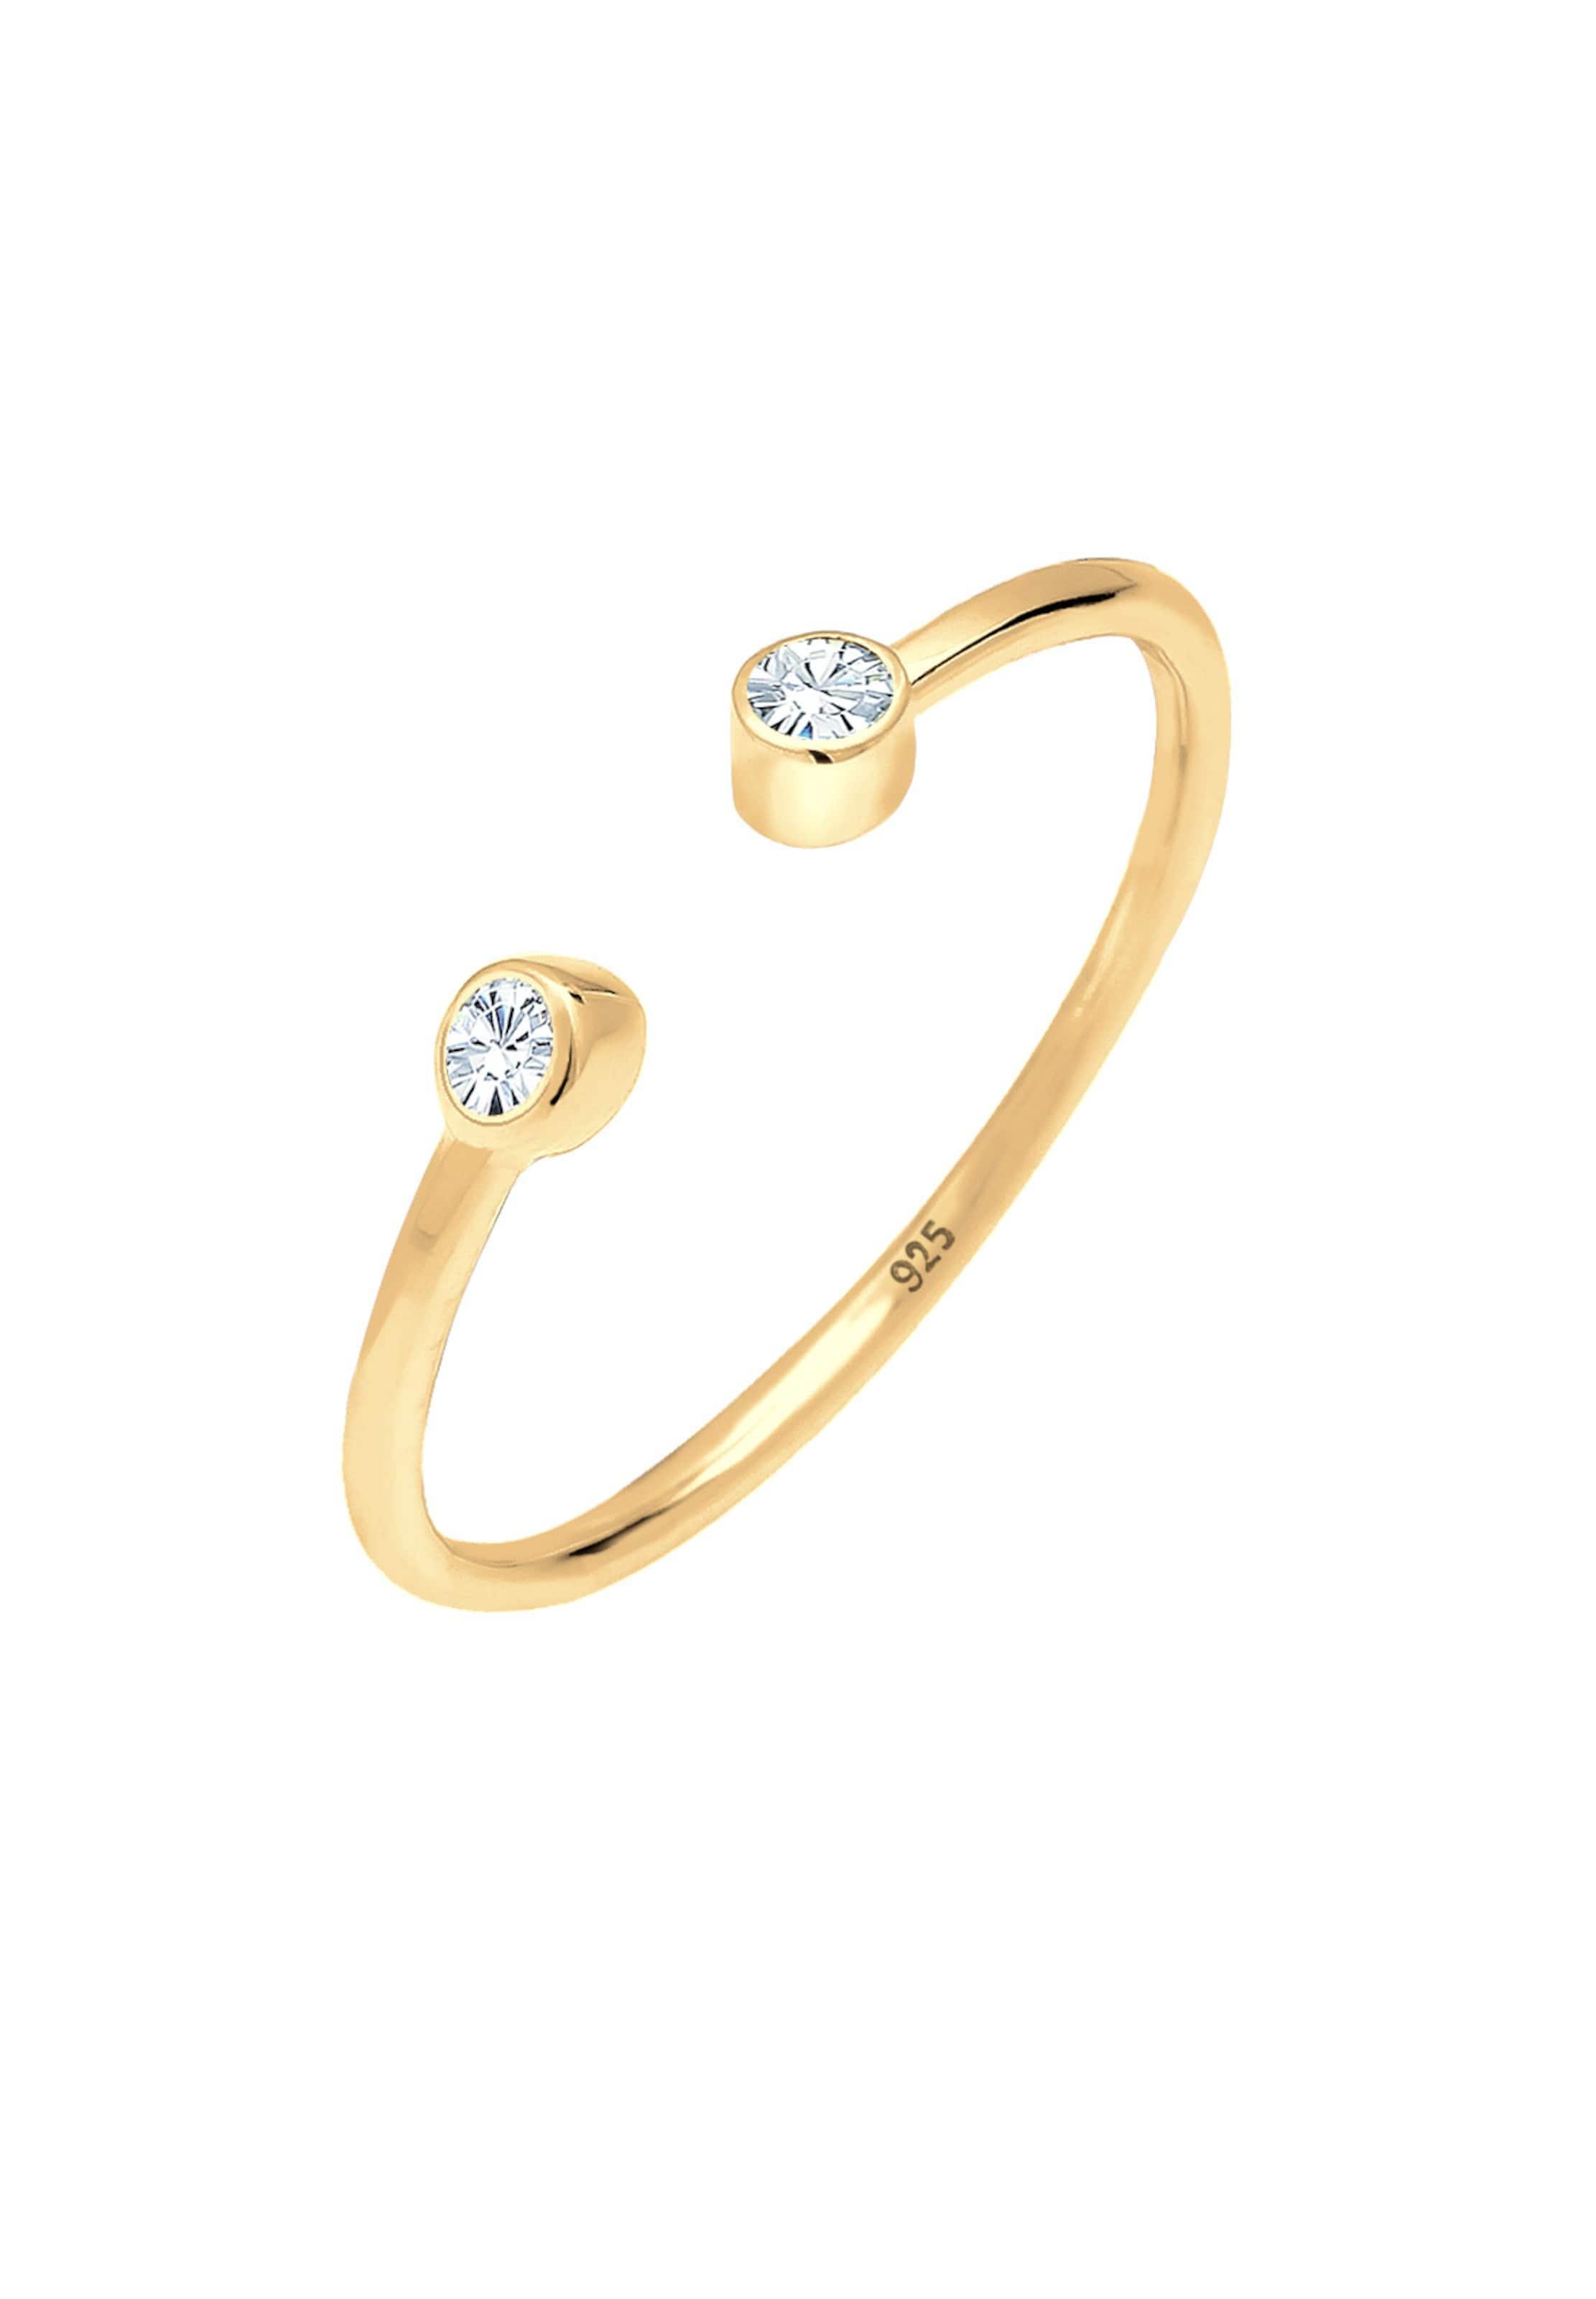 Elli In Ring In Ring Gold Elli k8XnwOP0